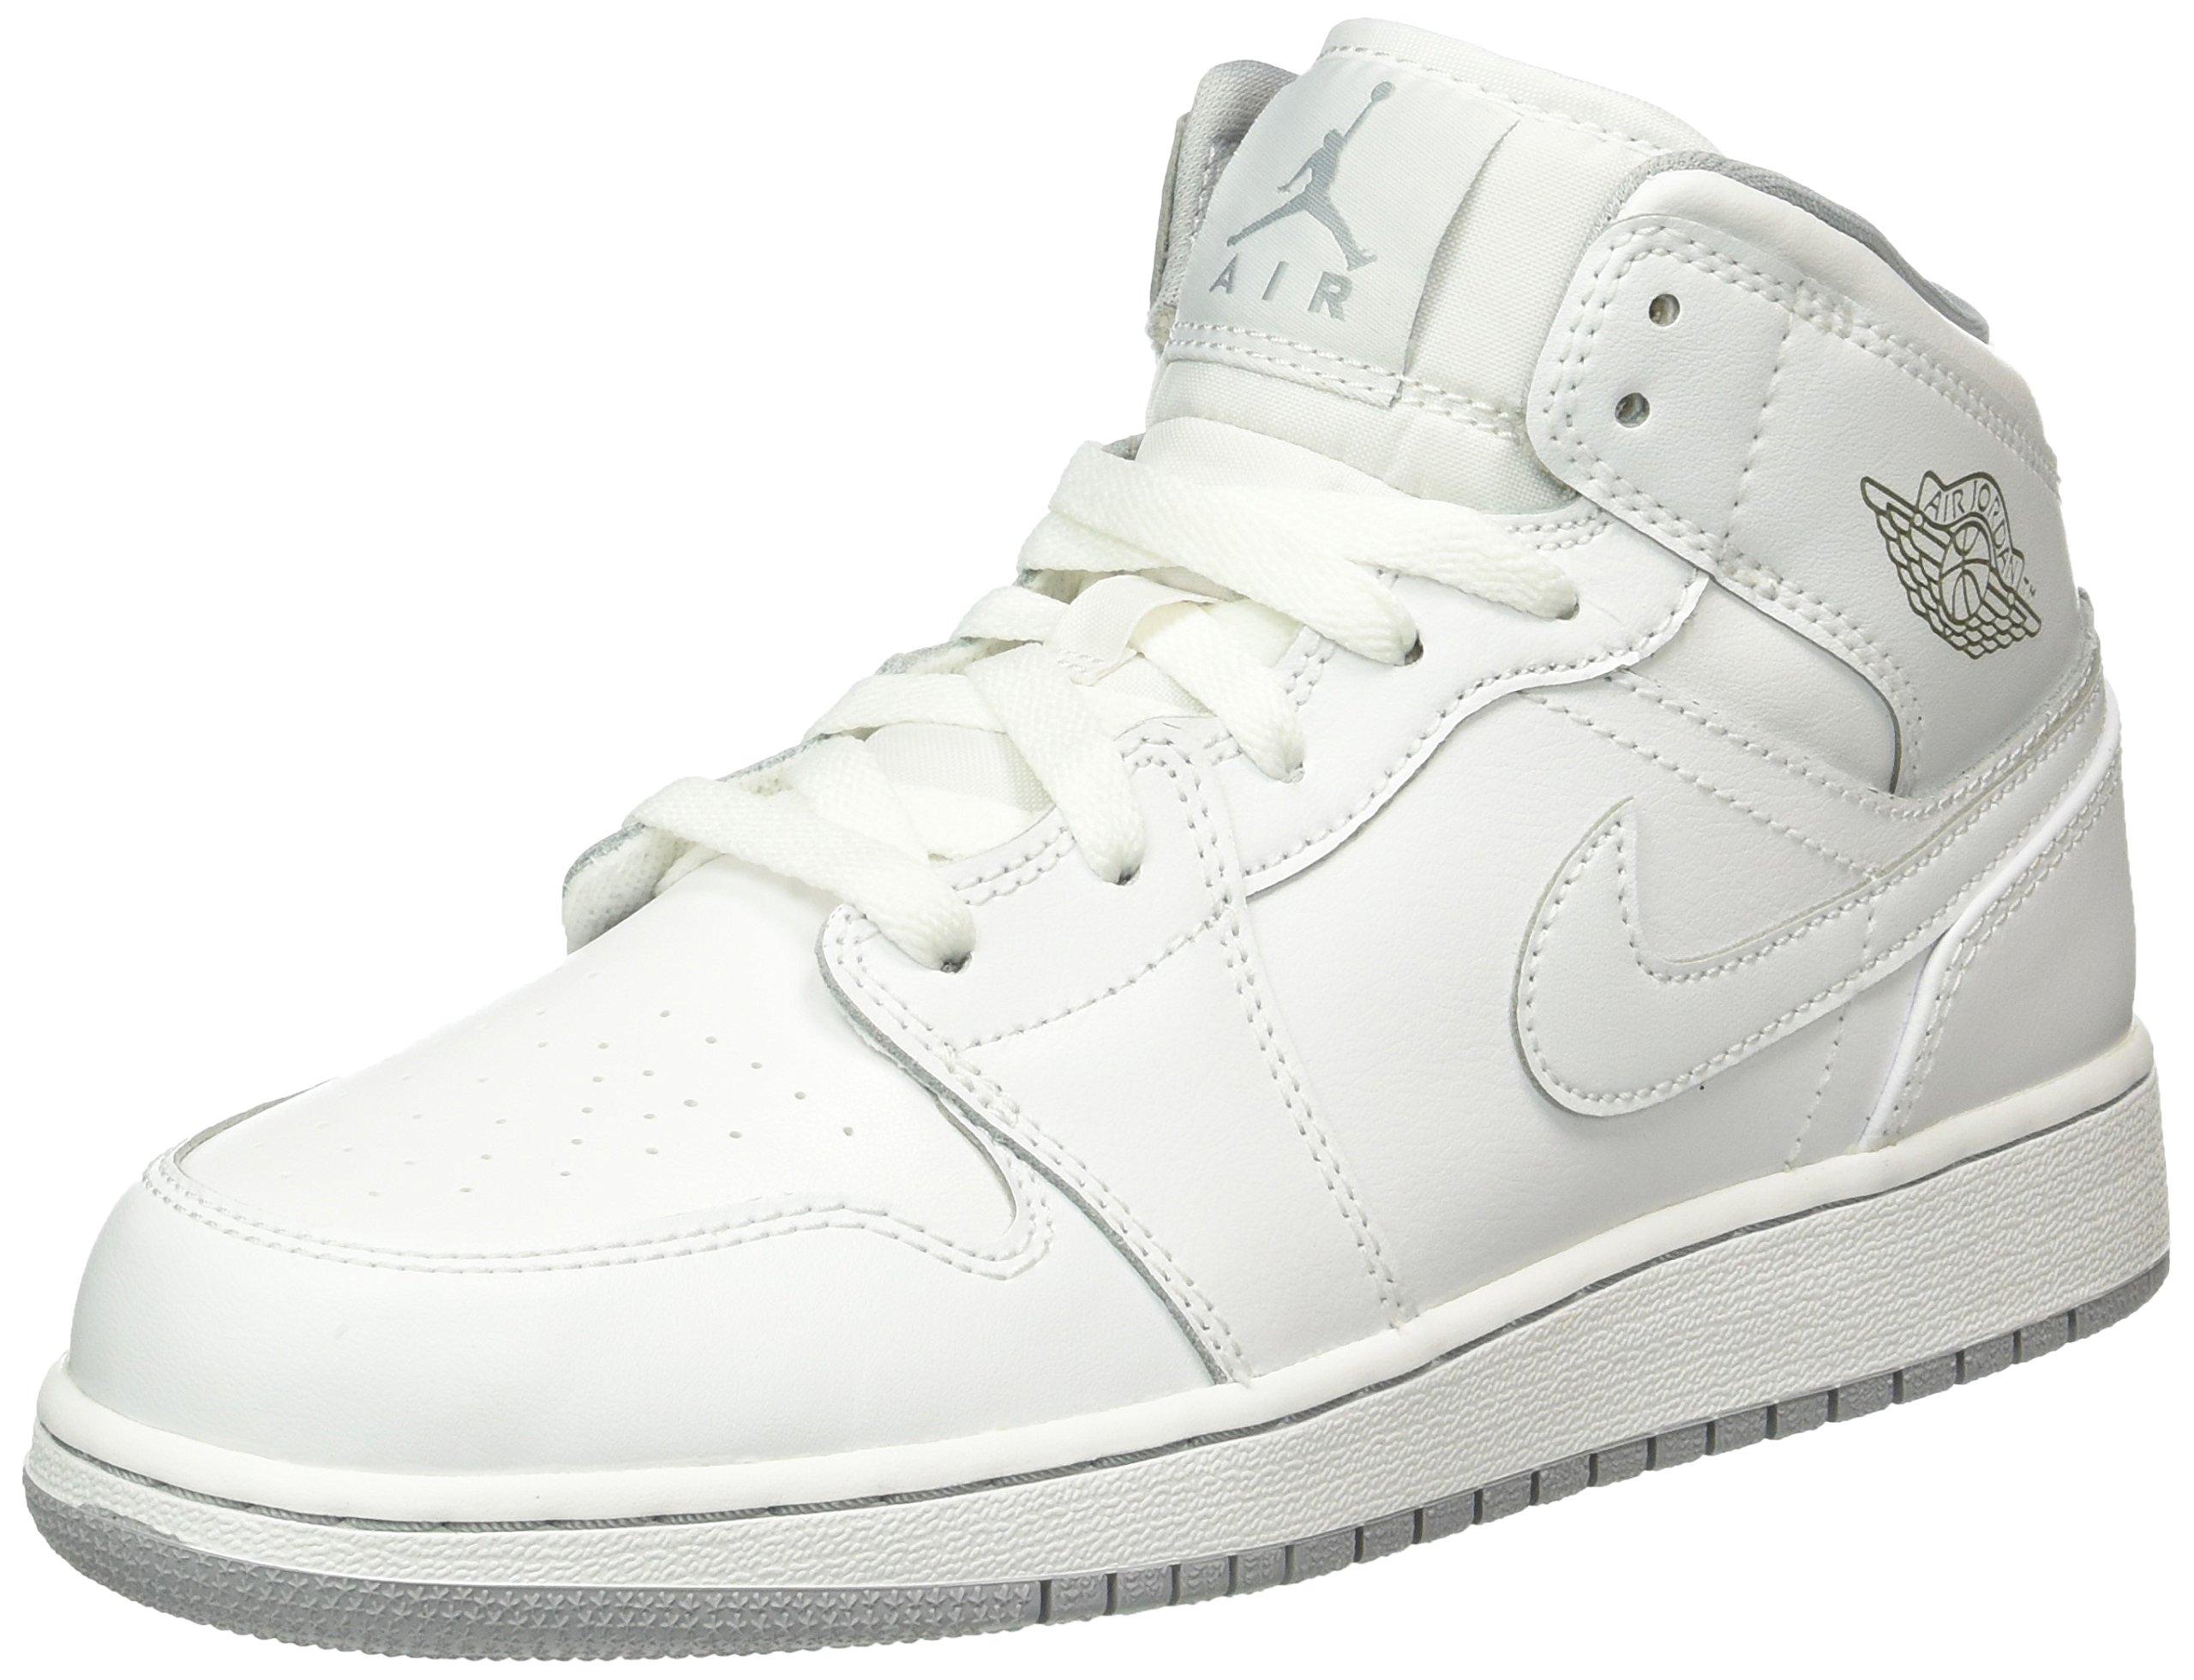 Jordan Nike Kids Air 1 Mid BG White/White/Wolf Grey Basketball Shoe 4.5 Kids US